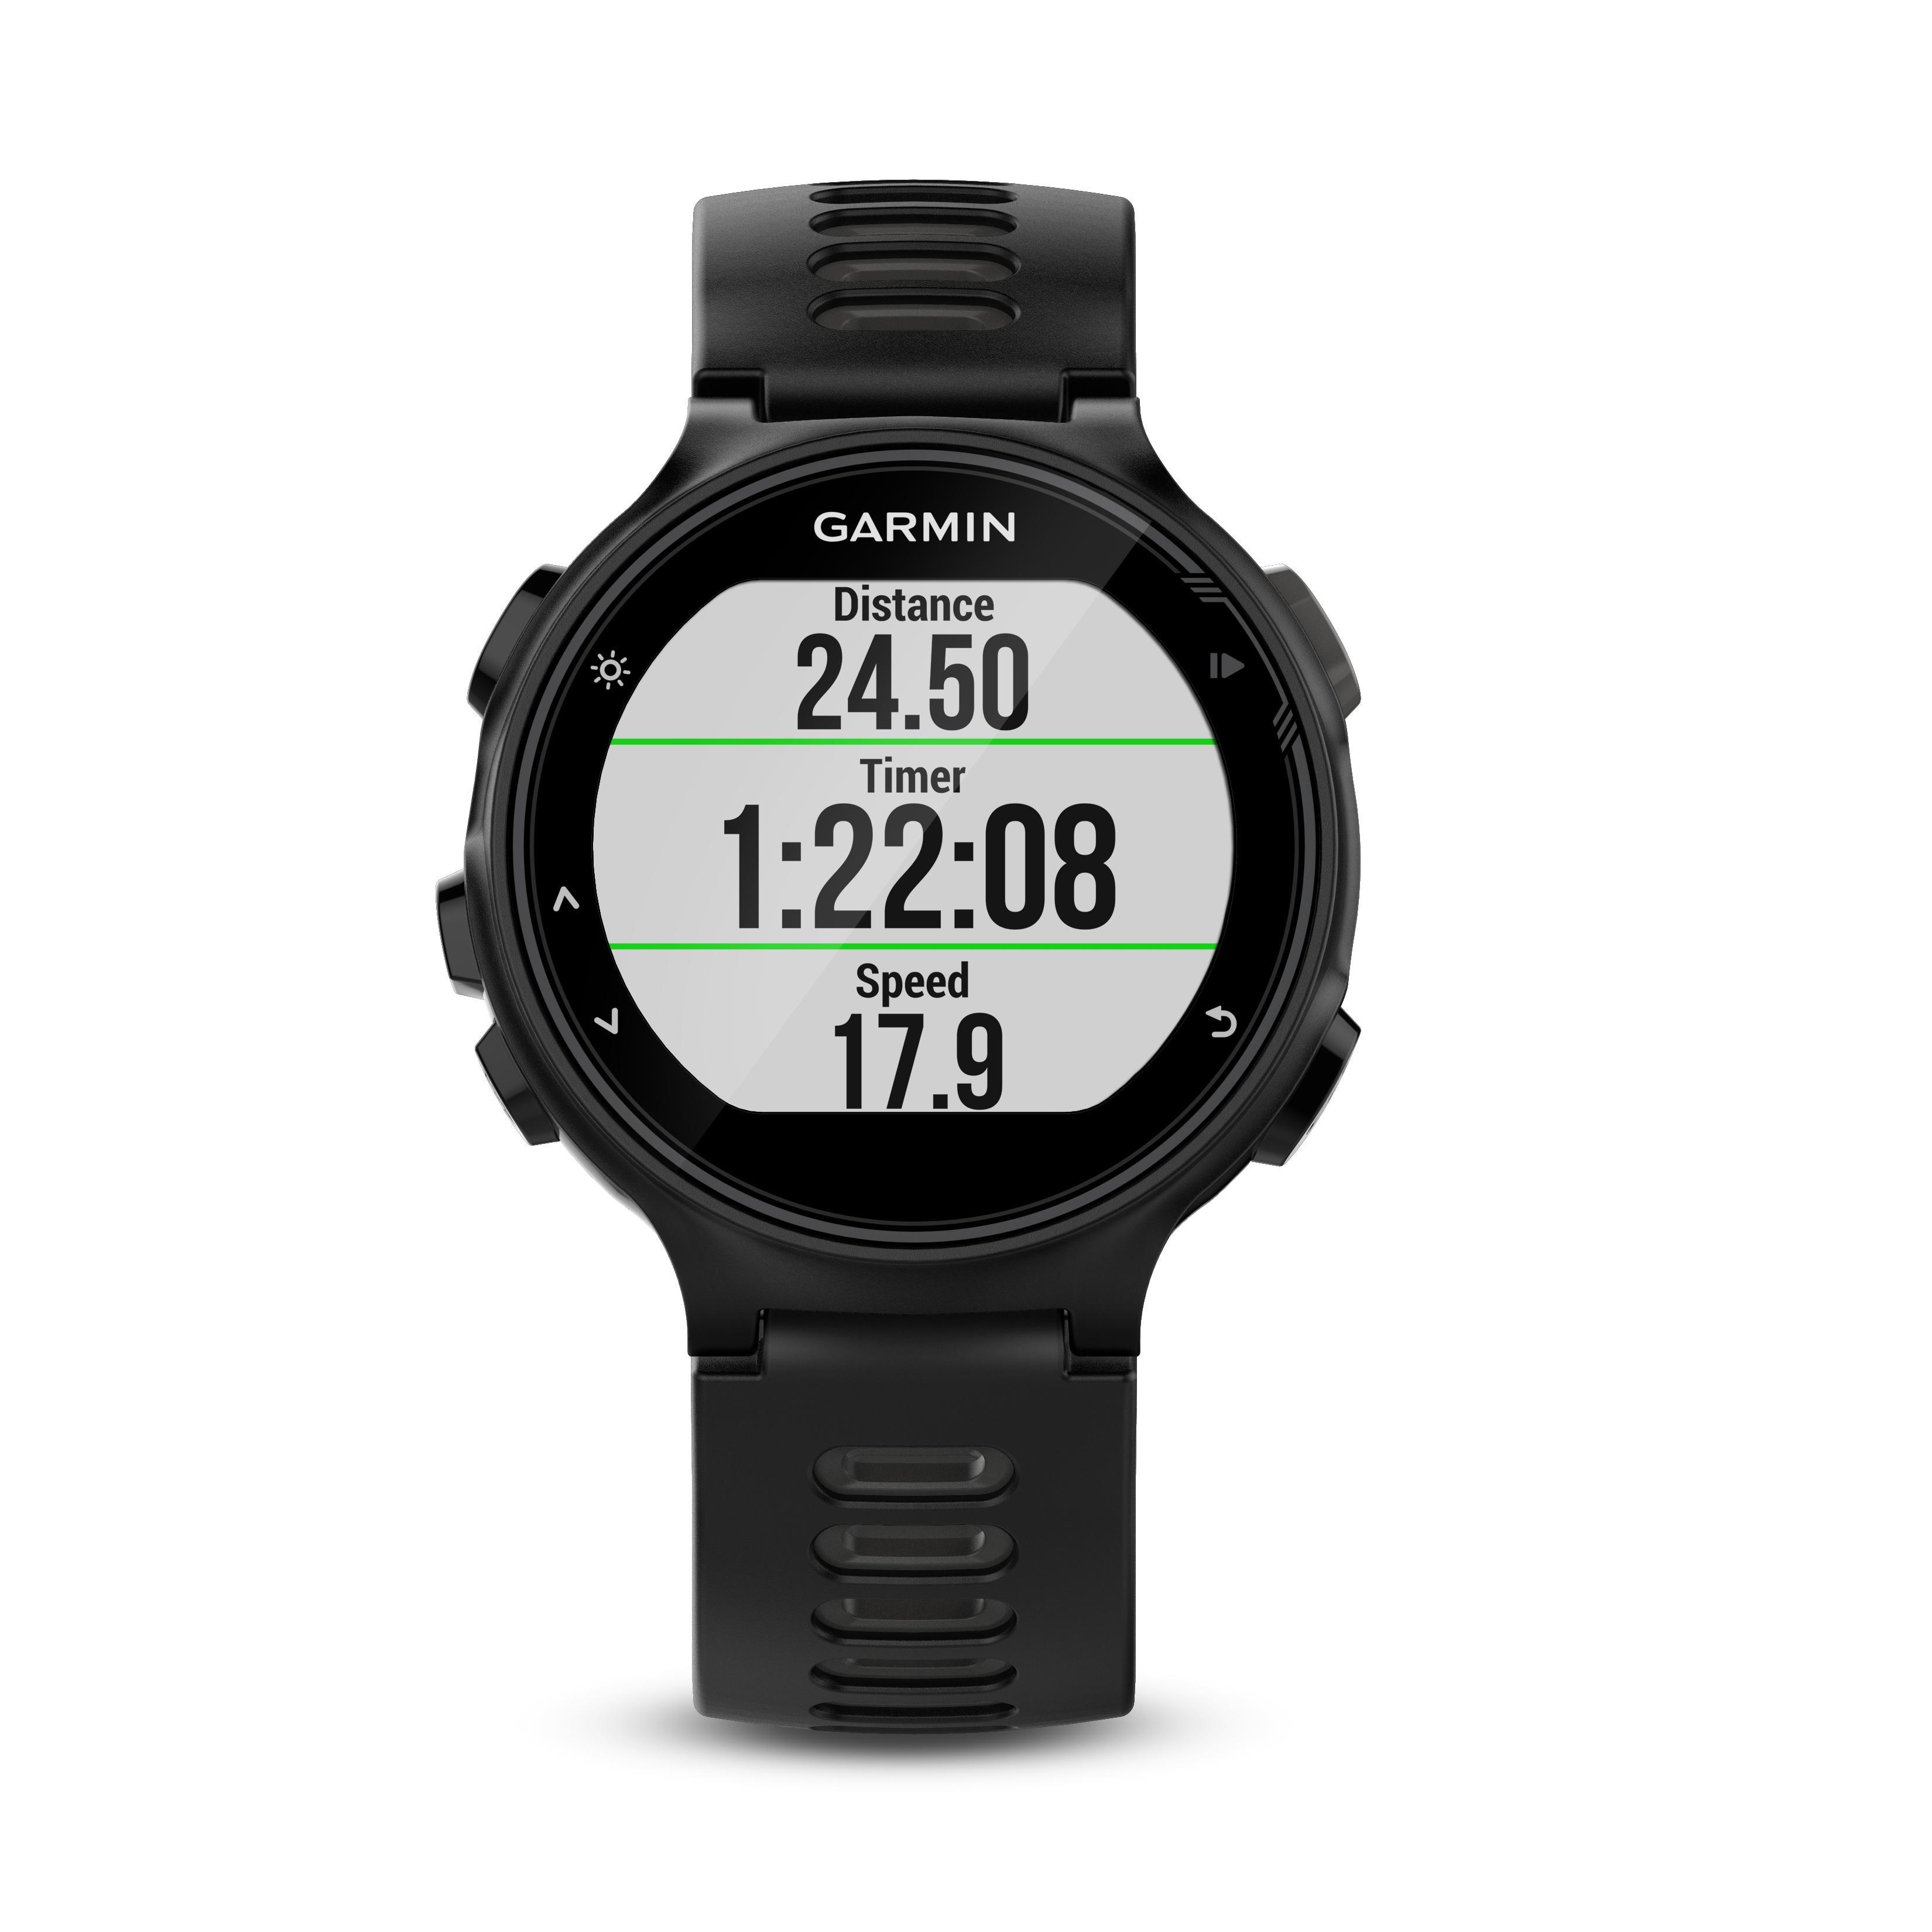 bf57c47acf Reloj GPS Pulsómetro Muñeca Multideporte Garmin Forerunner 735 XT Negro  Garmin